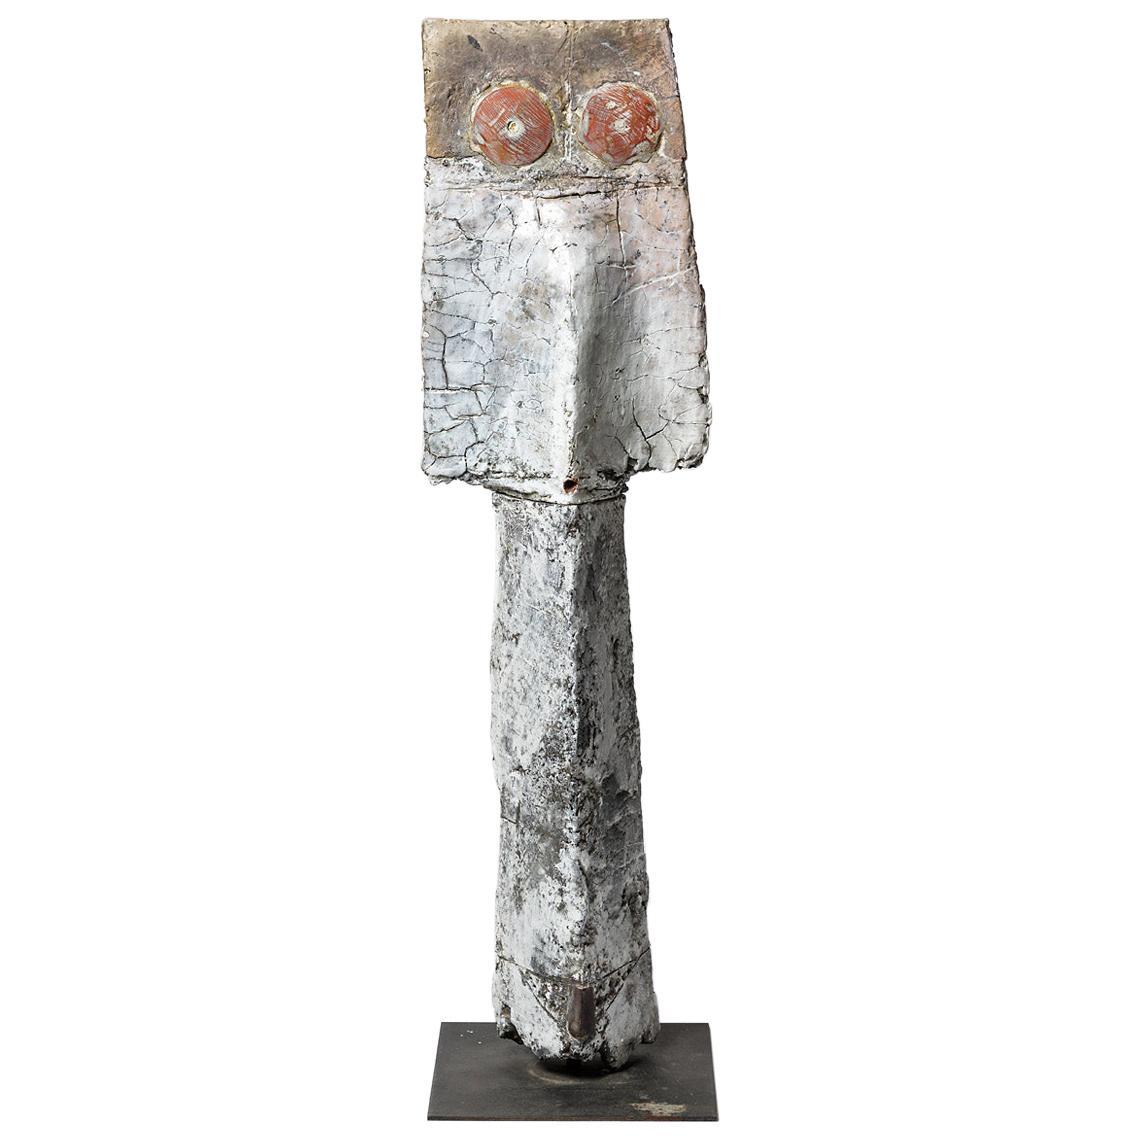 Big Ceramic Sculpture by Camille Virot, circa 1990-2000